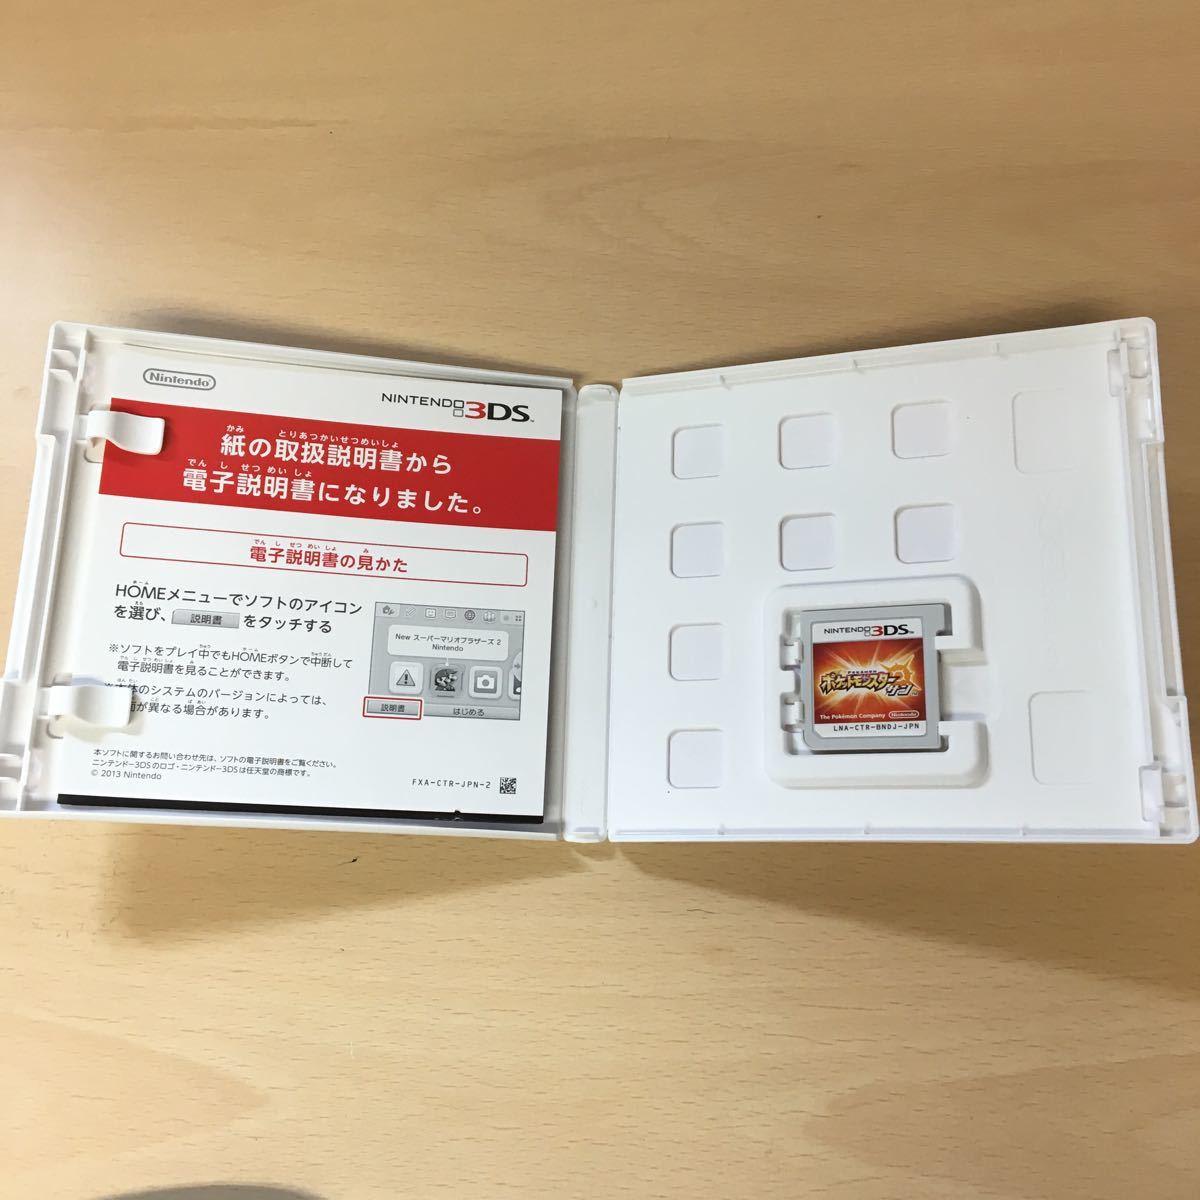 Nintendo 任天堂 3DS 3DSソフト ゼルダの伝説 時のオカリナ 世界樹の迷宮V ポケットモンスター サン_画像3